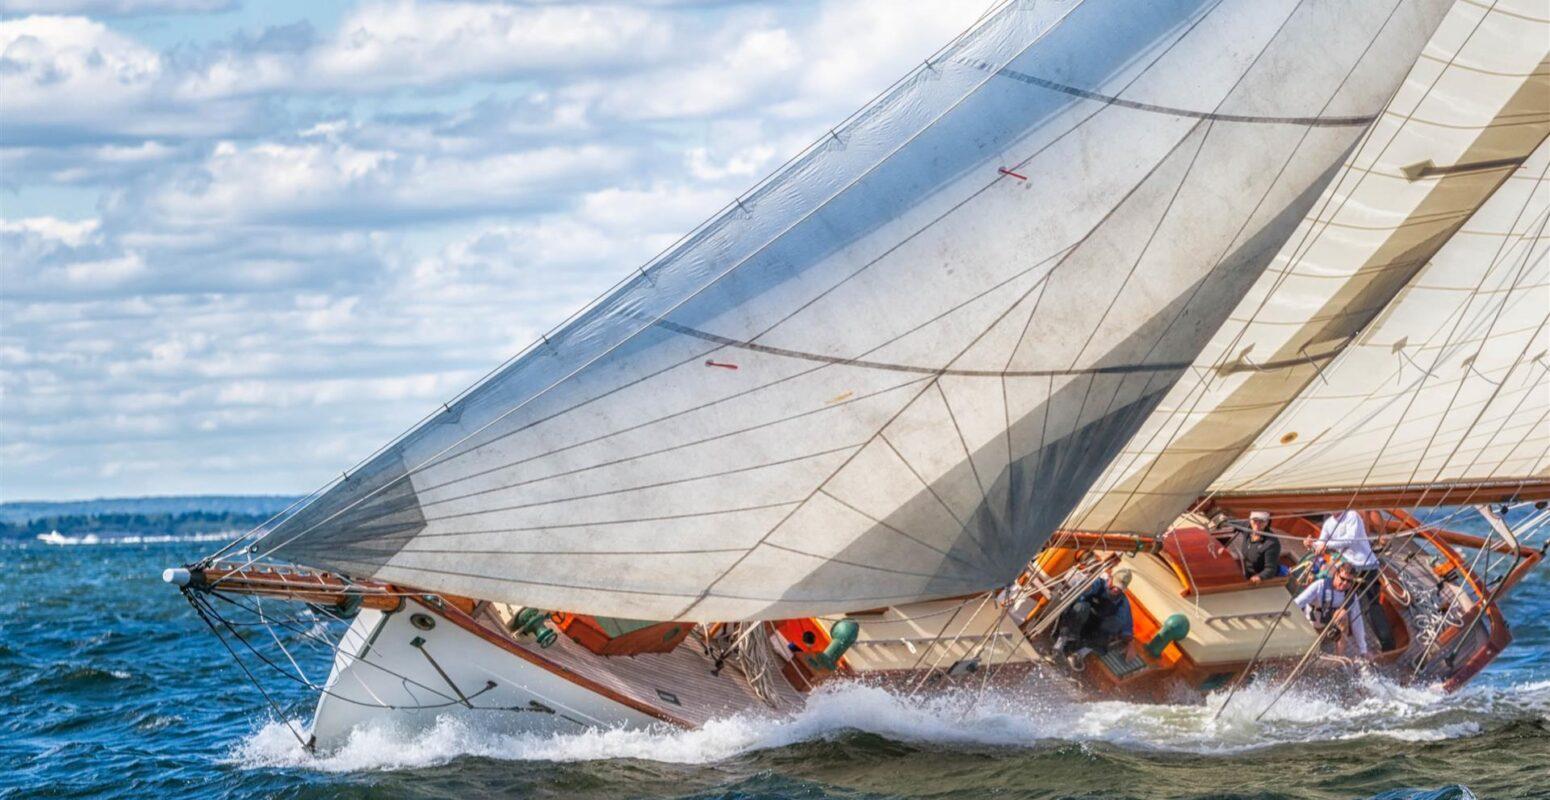 Sailboats & Sunsets Online Exhibit